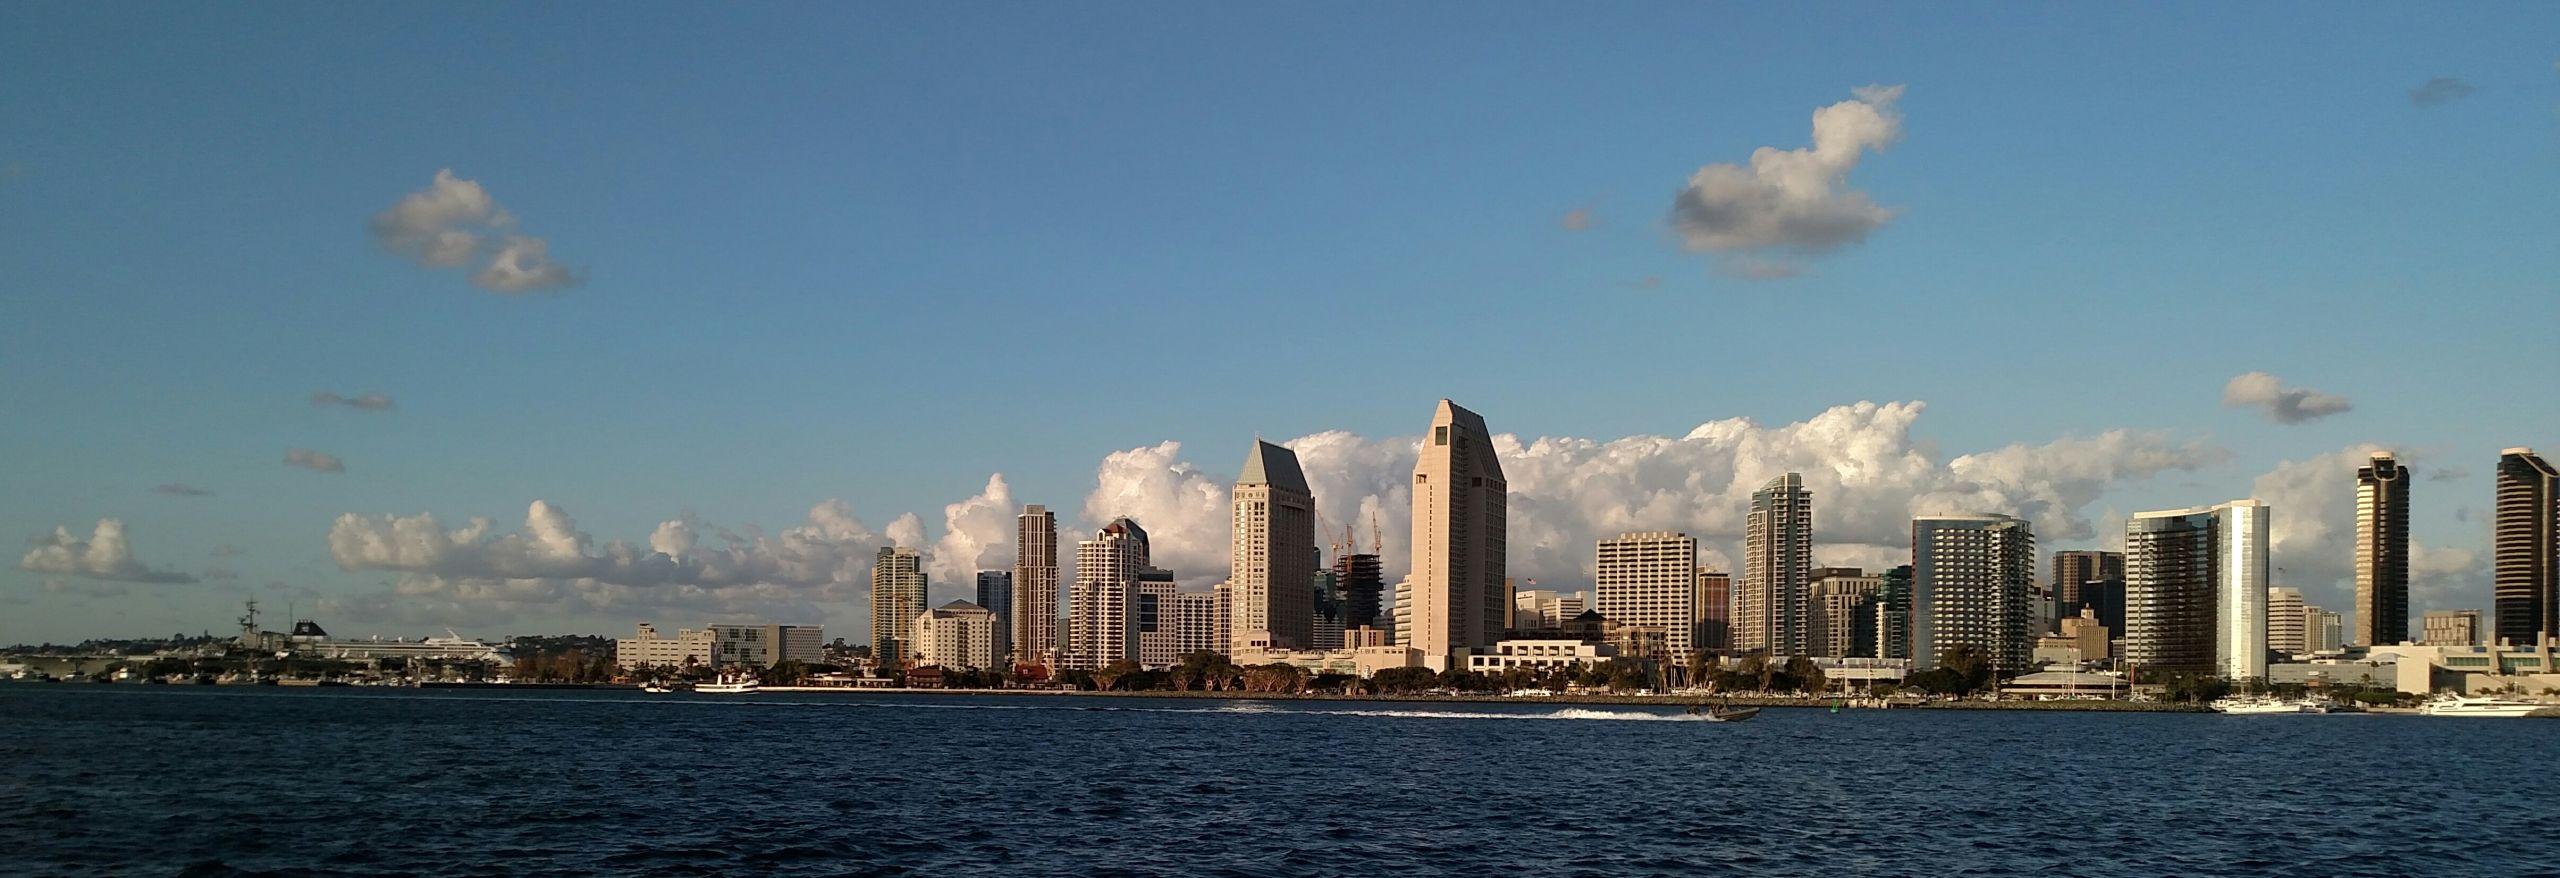 View from Coronado Island San Diego